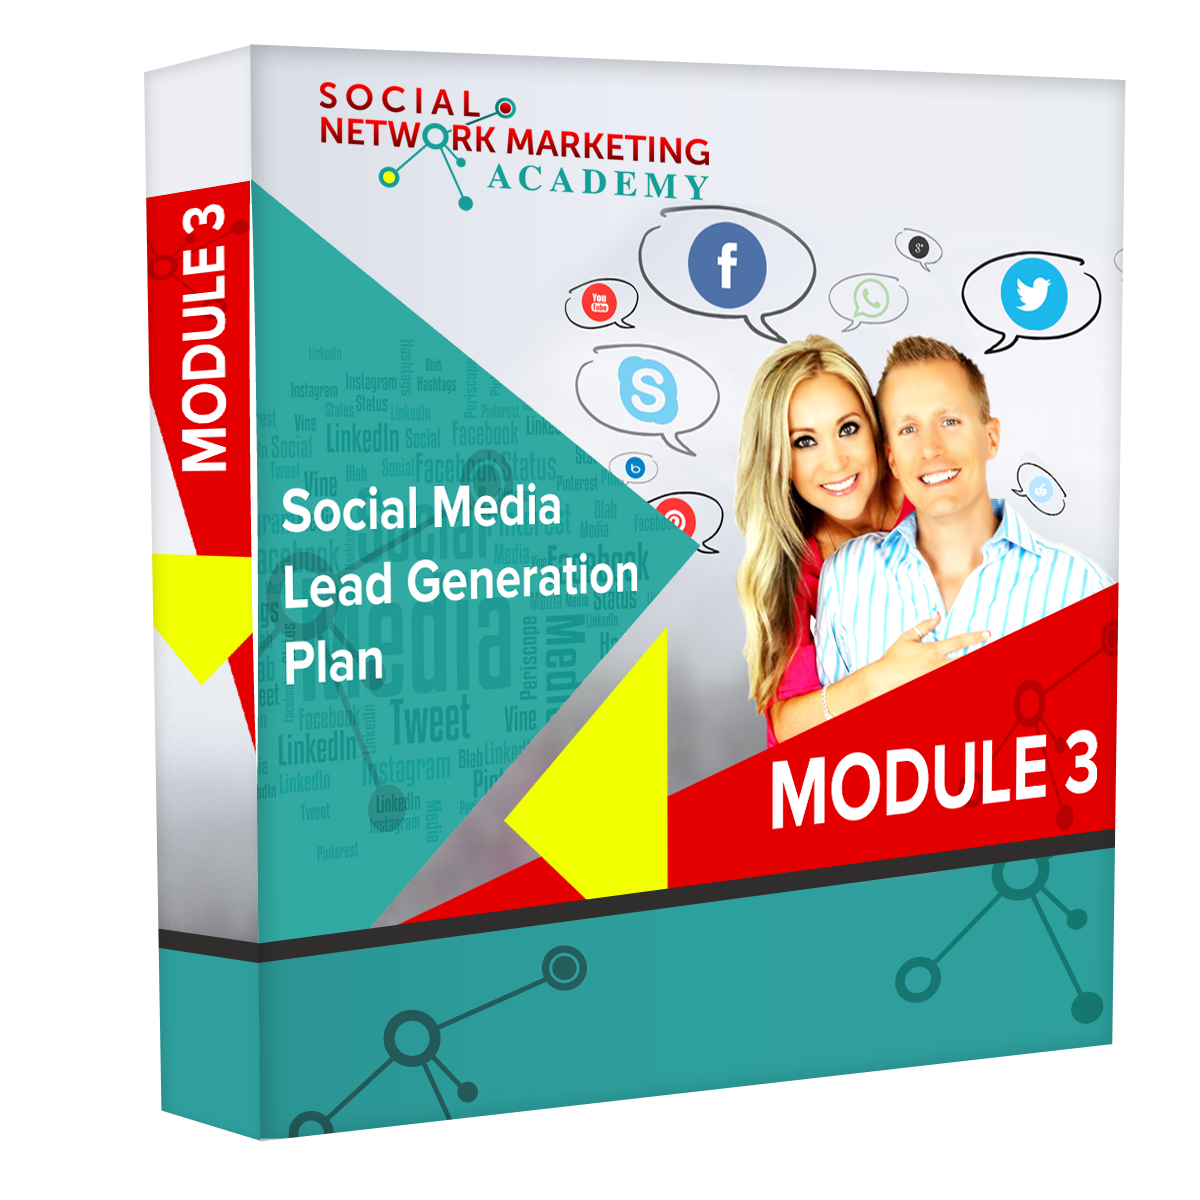 Module 3 : The Ultimate Lead Generation Plan